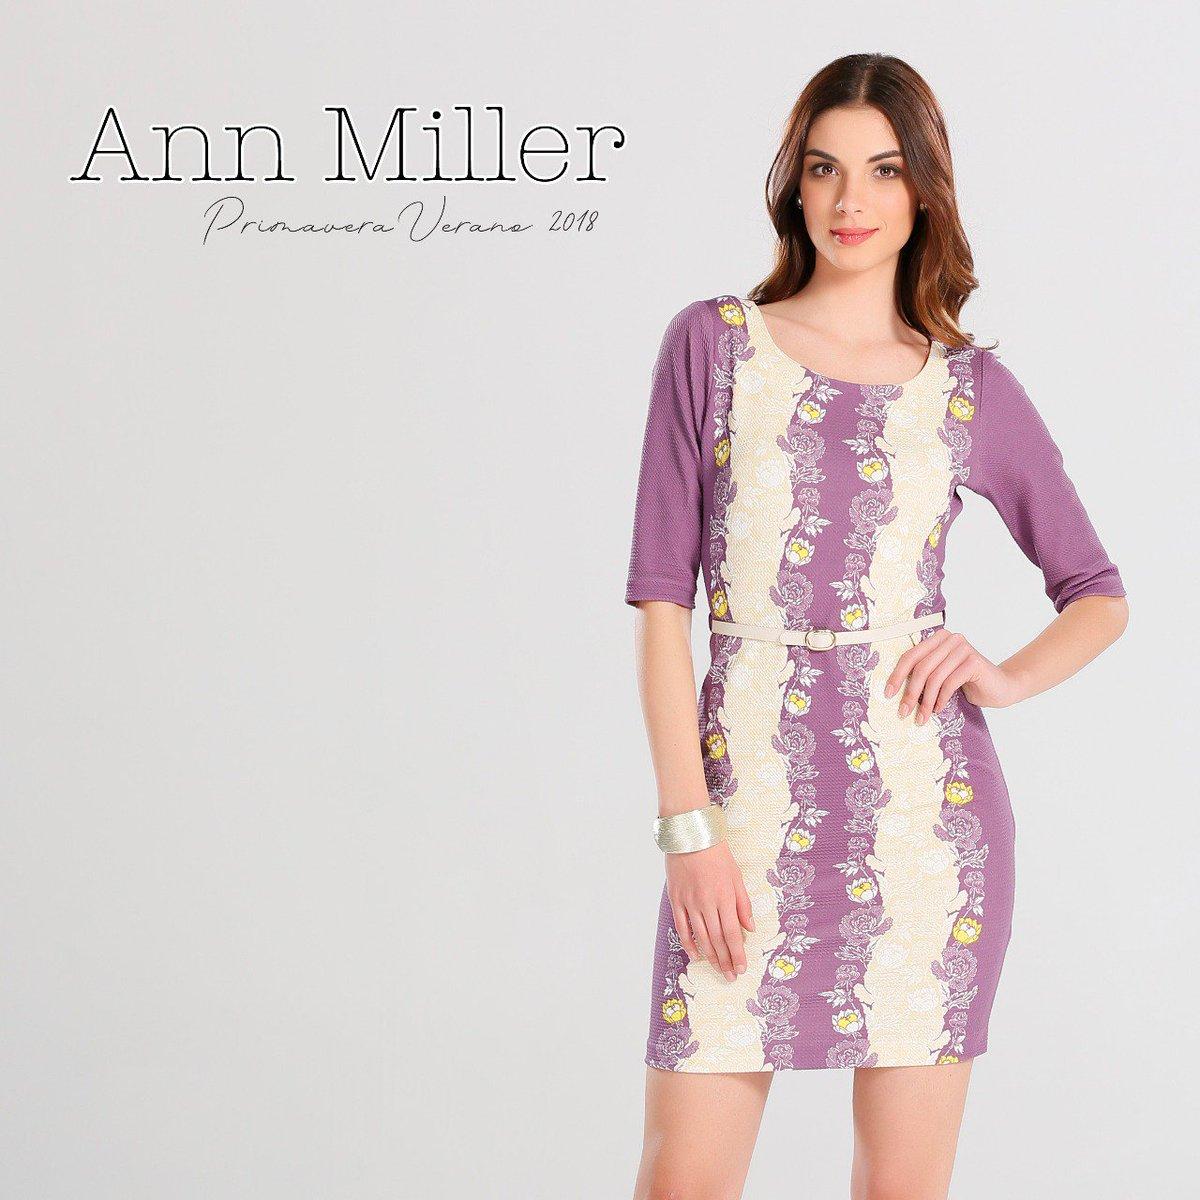 d41d3b9d5a7c4 Trajes sastres para dama ann miller - Vestidos elegantes